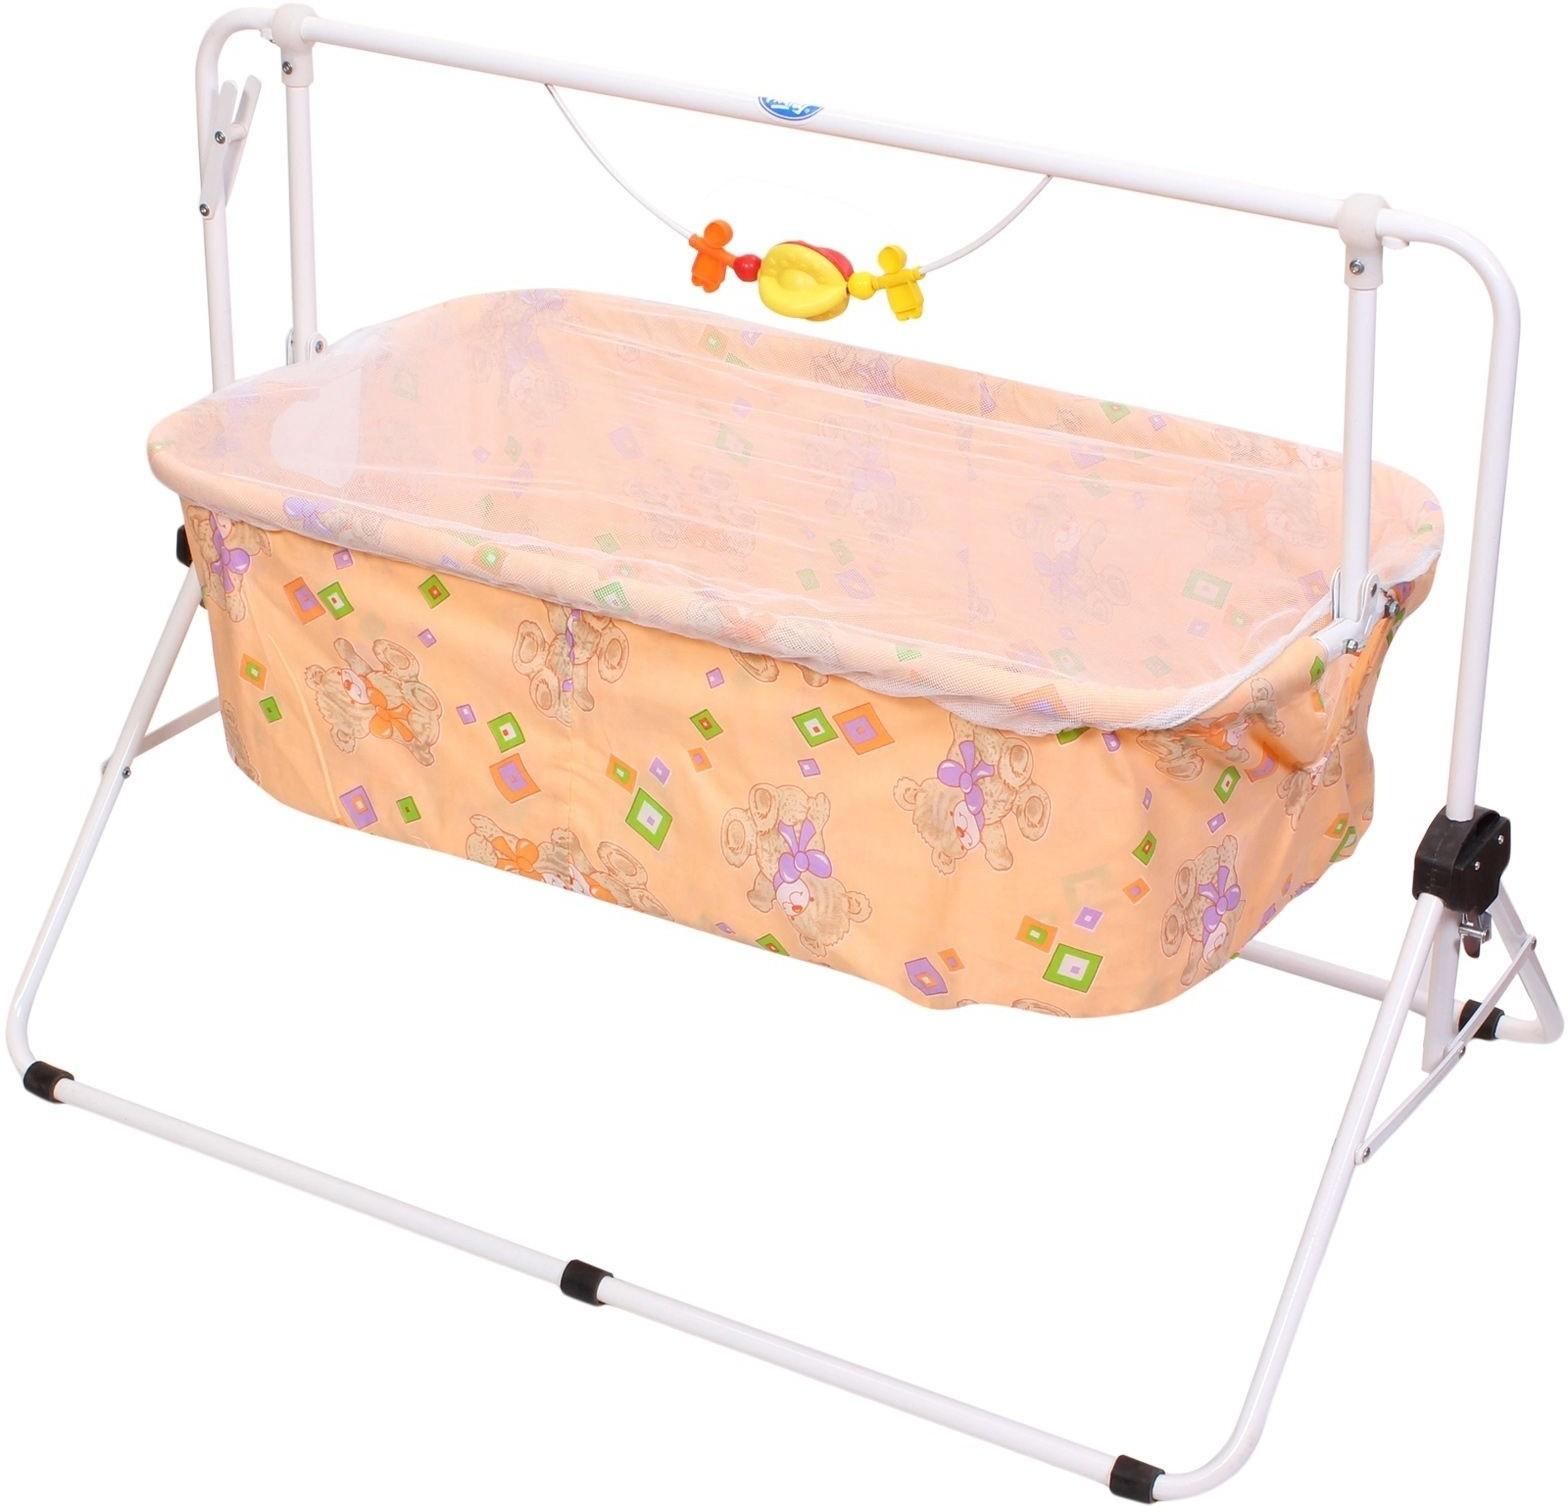 Crib for babies online india - New Natraj Baby Cradle Peach